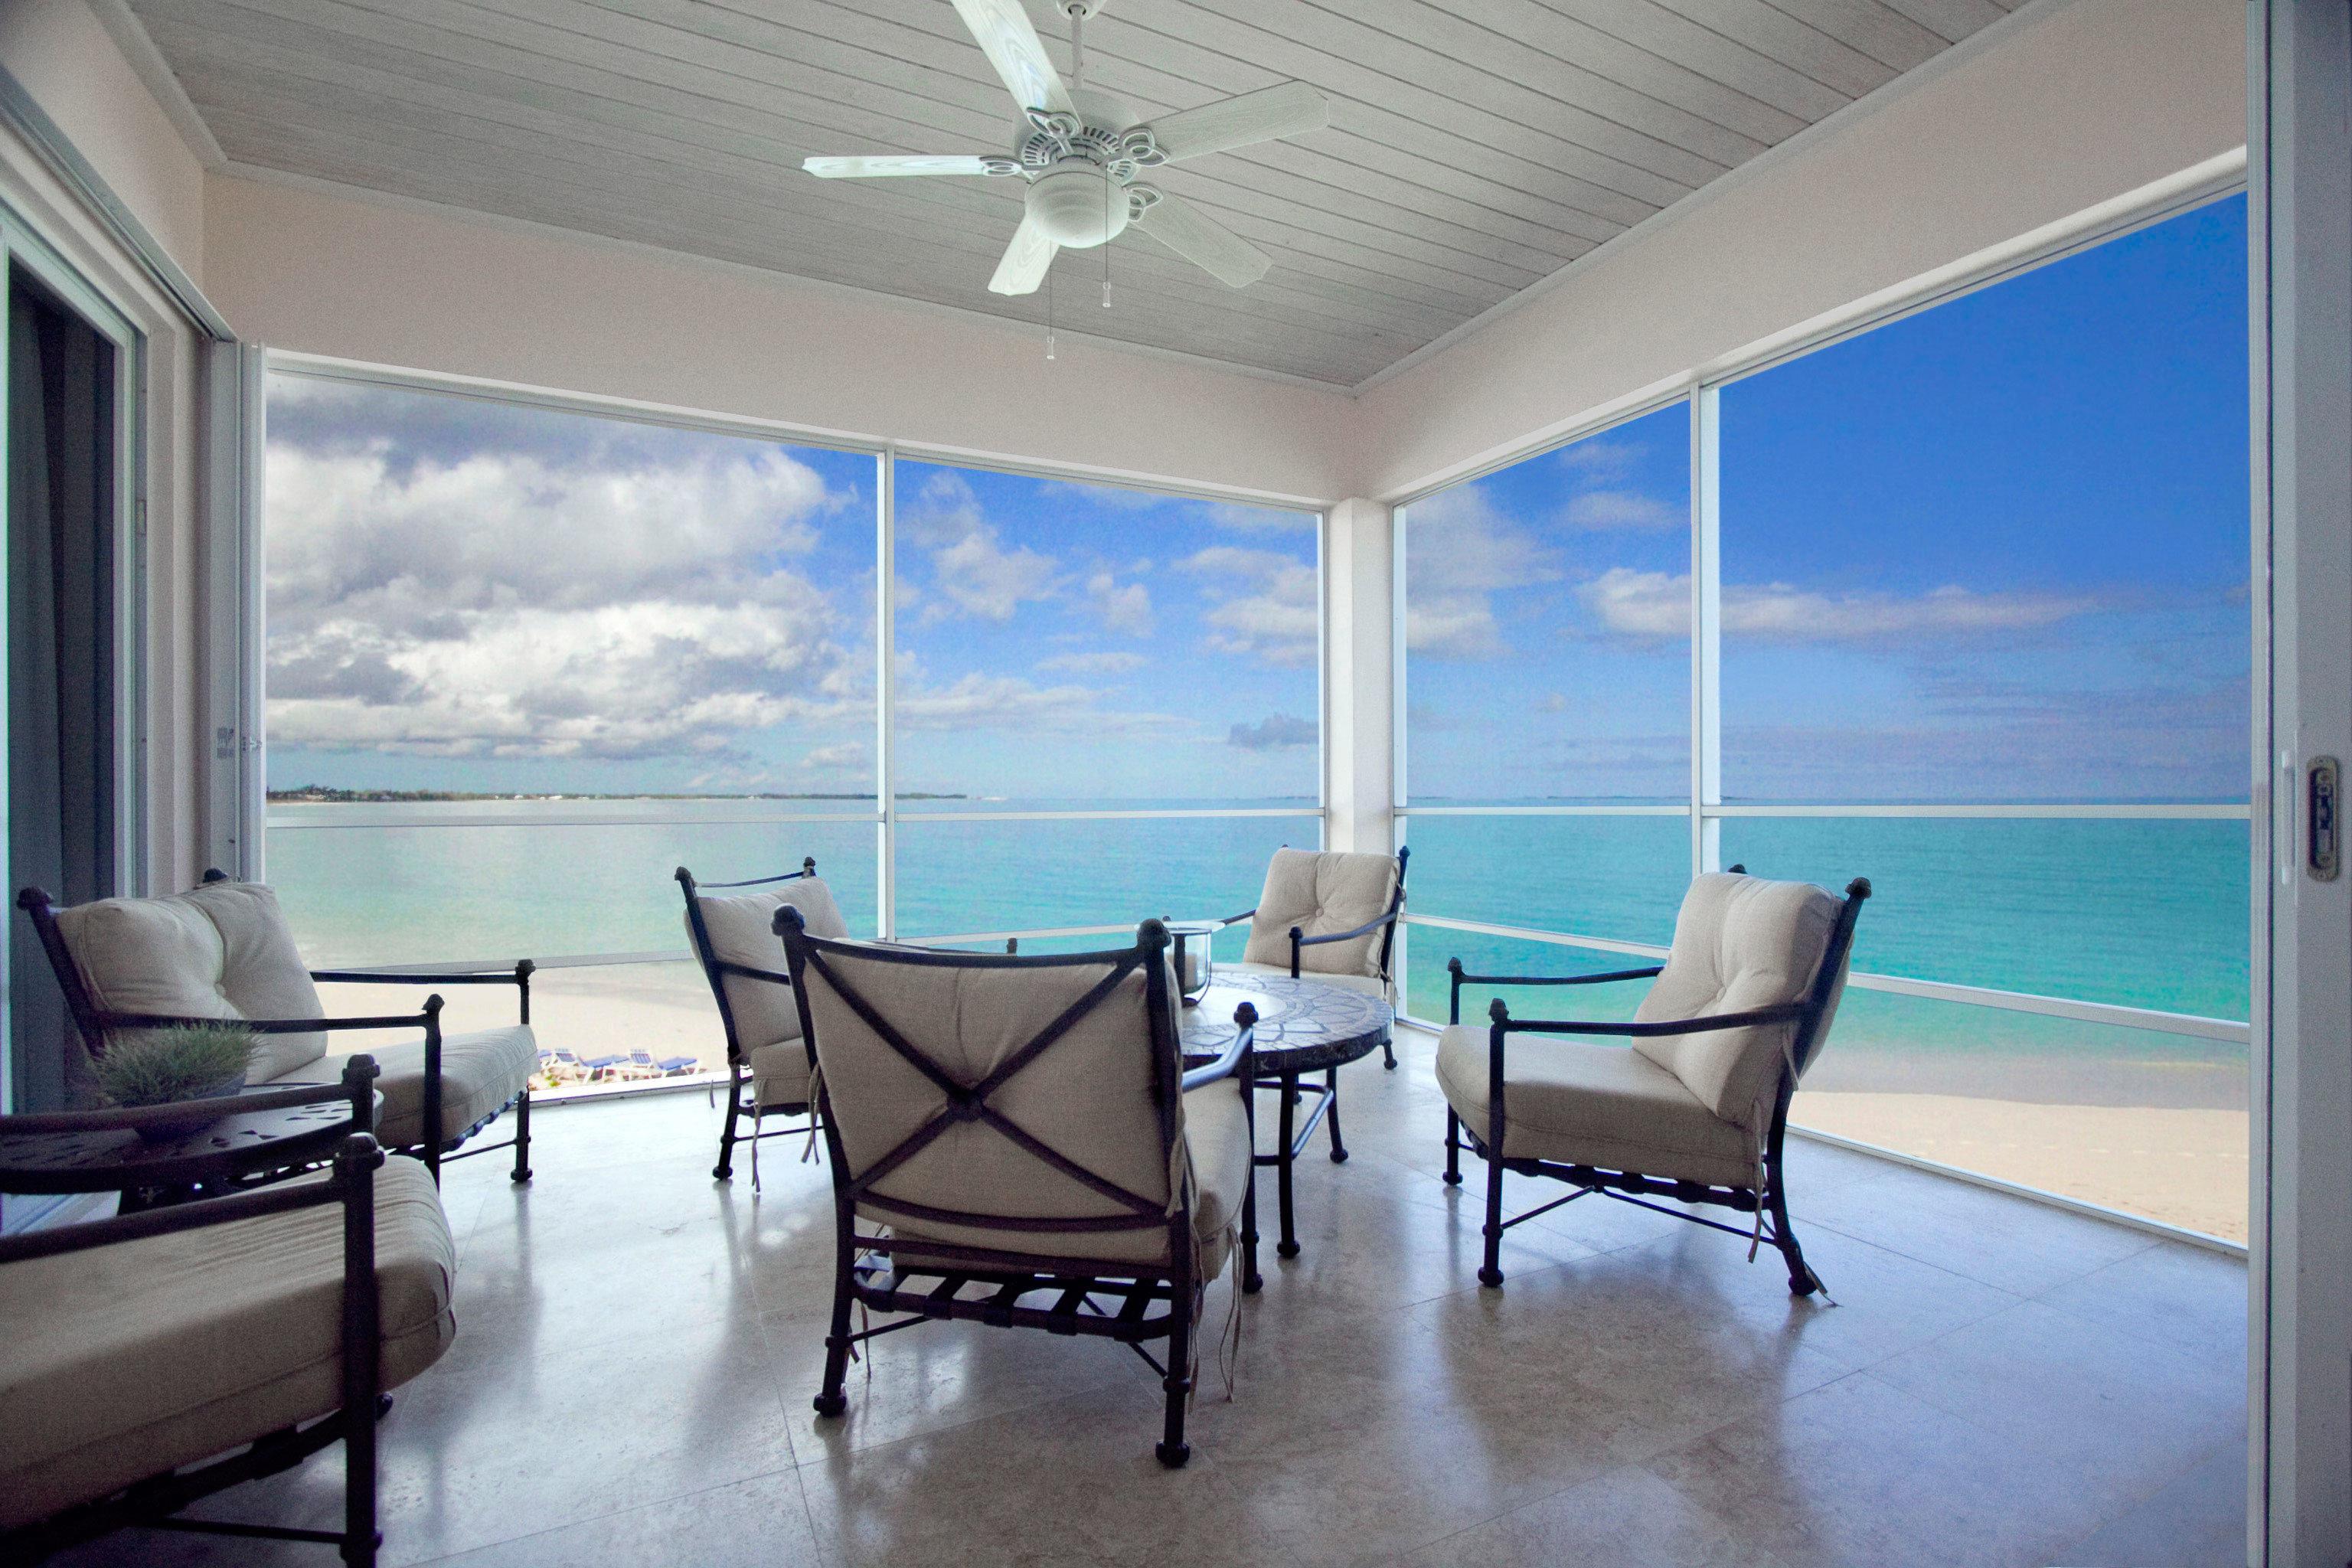 Beach Beachfront Lounge Patio Resort property building chair house home condominium living room porch Villa Suite Deck